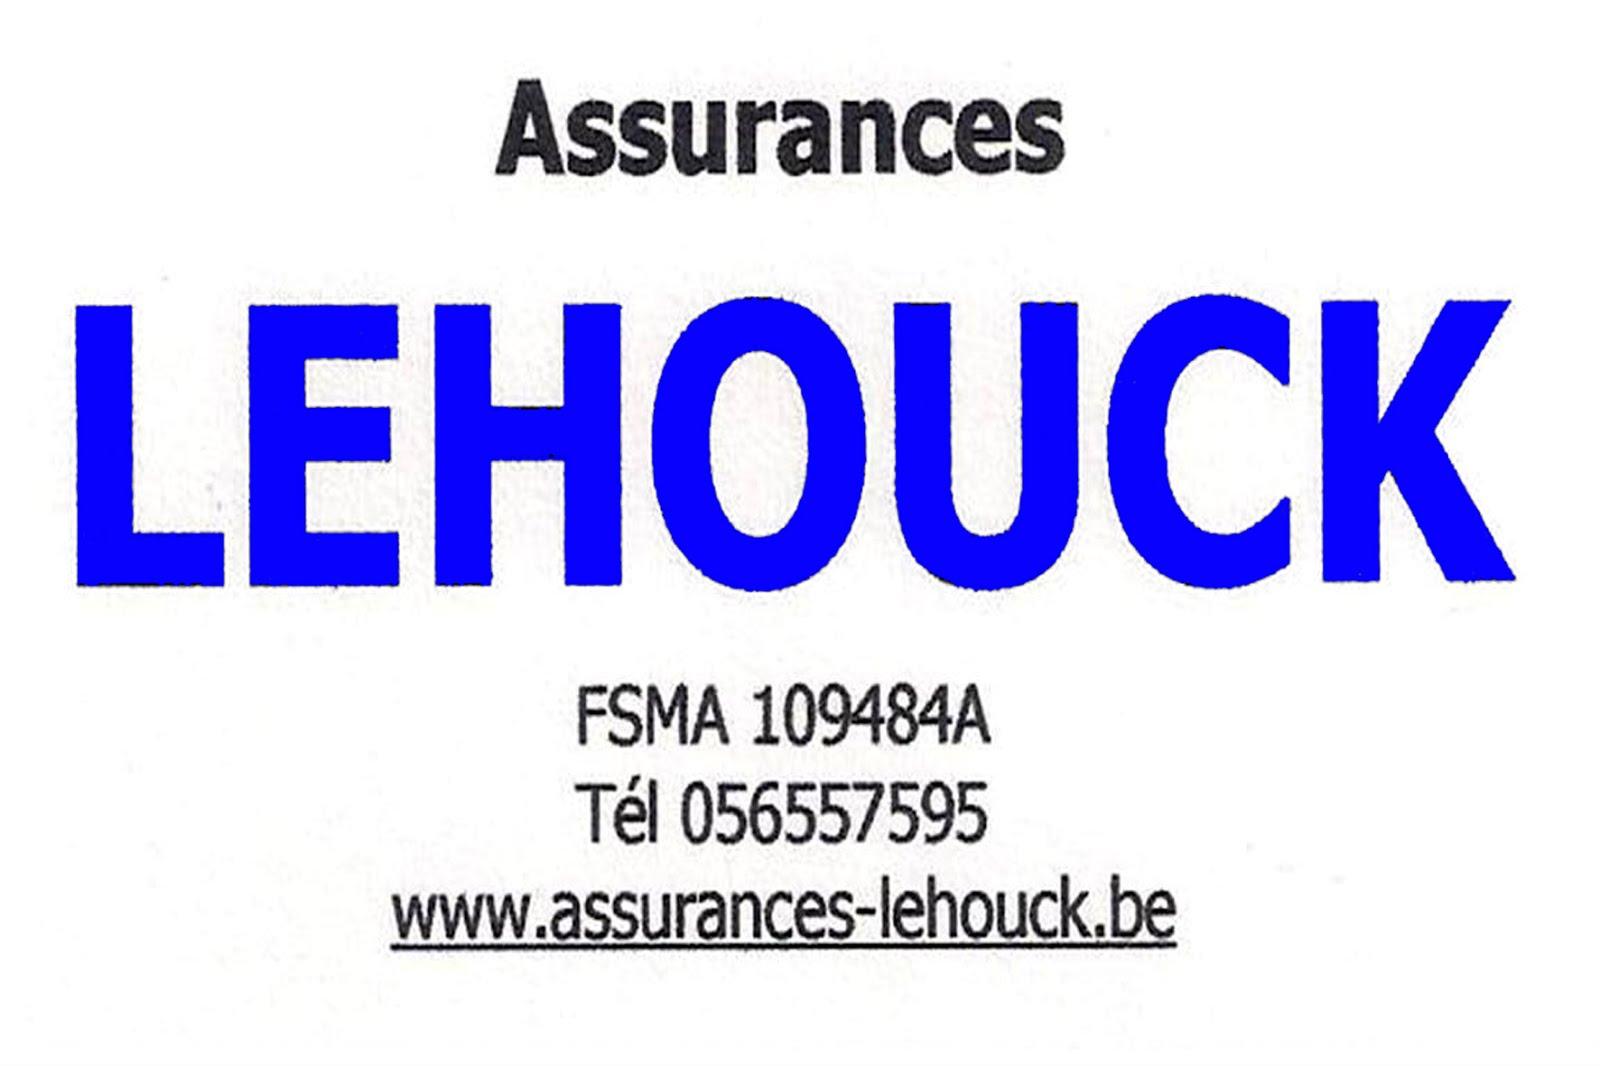 ASSURANCES LEHOUCK